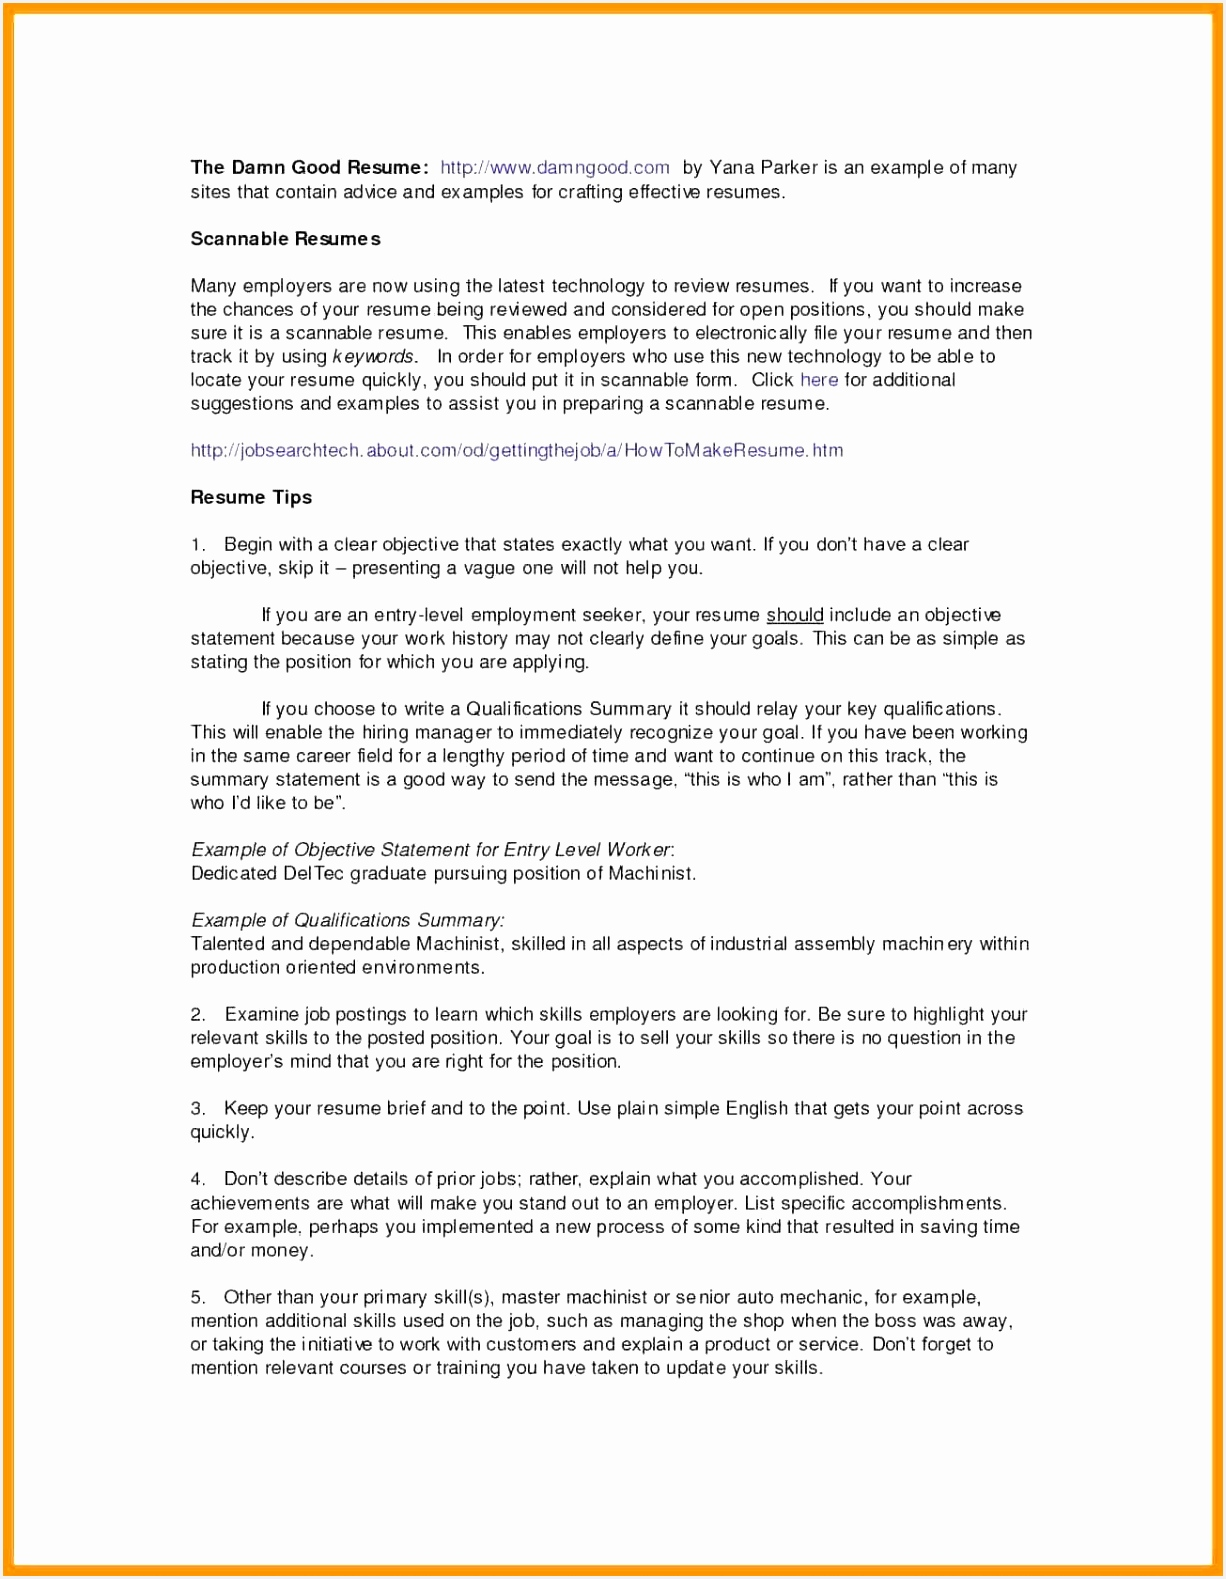 Career Resume Examples New Resume Skills for Customer Service Ideas Career Resume Examples Beautiful Resum15791226fEkca